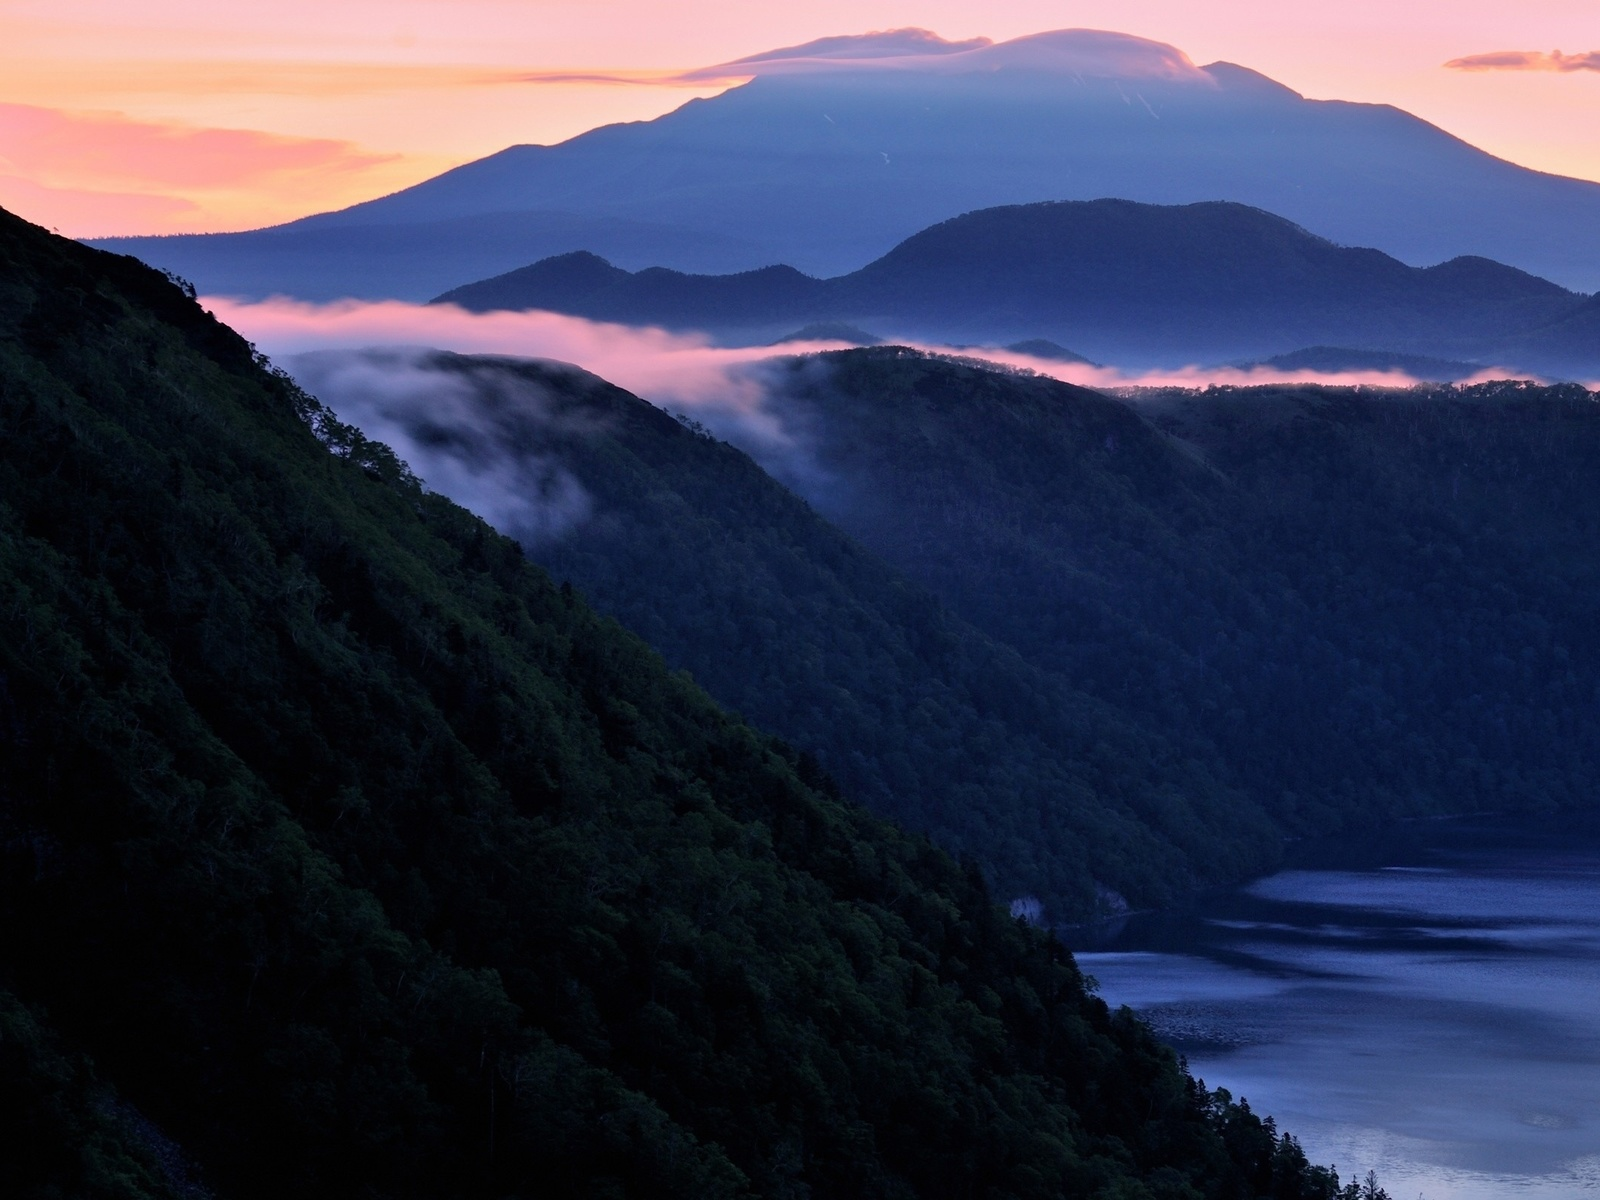 горы, туман, море, утро